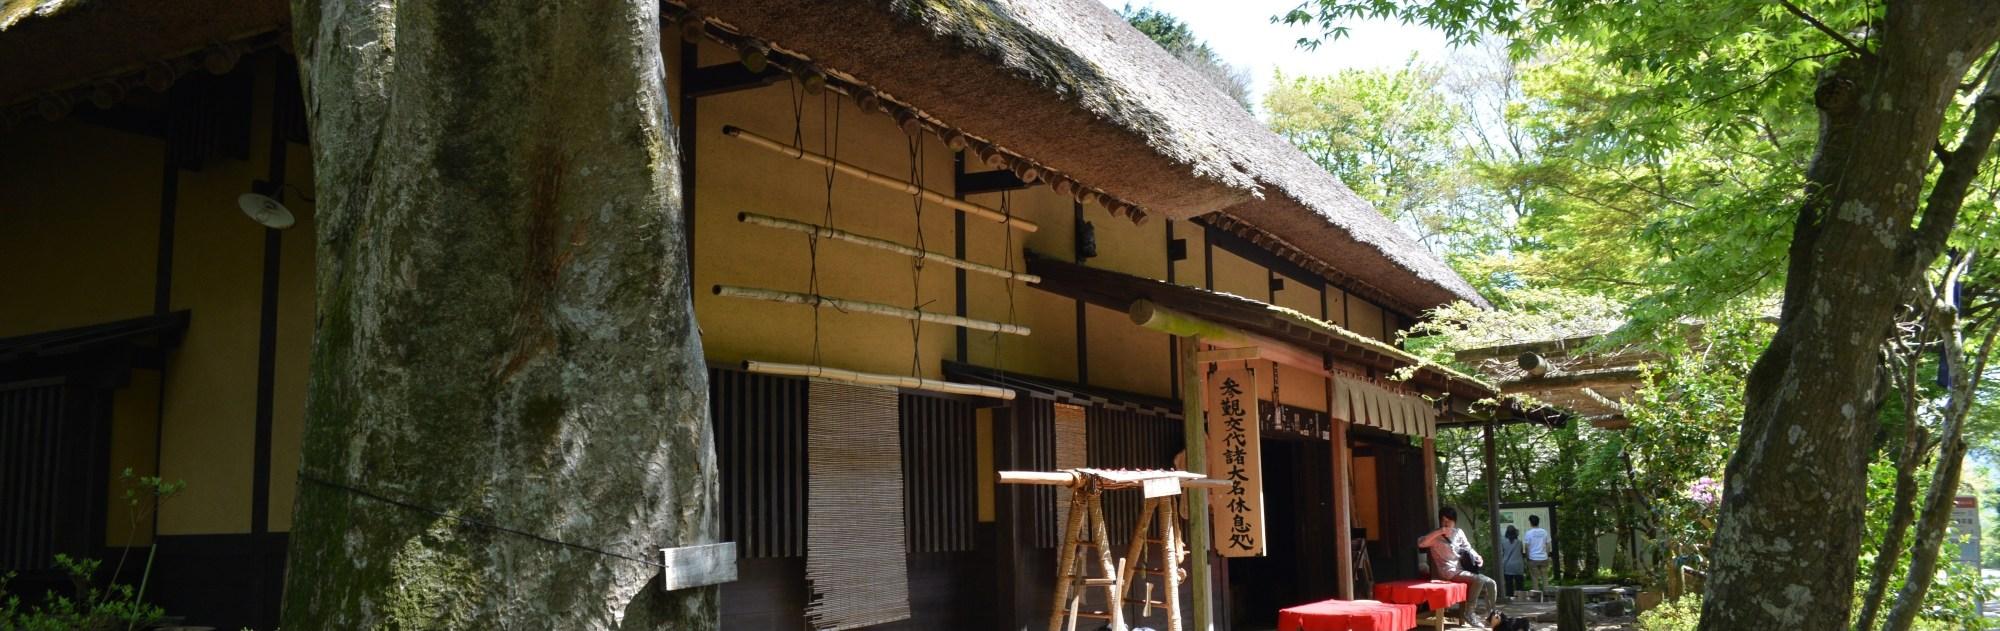 Amazakeya Chaya teahouse, Hakone